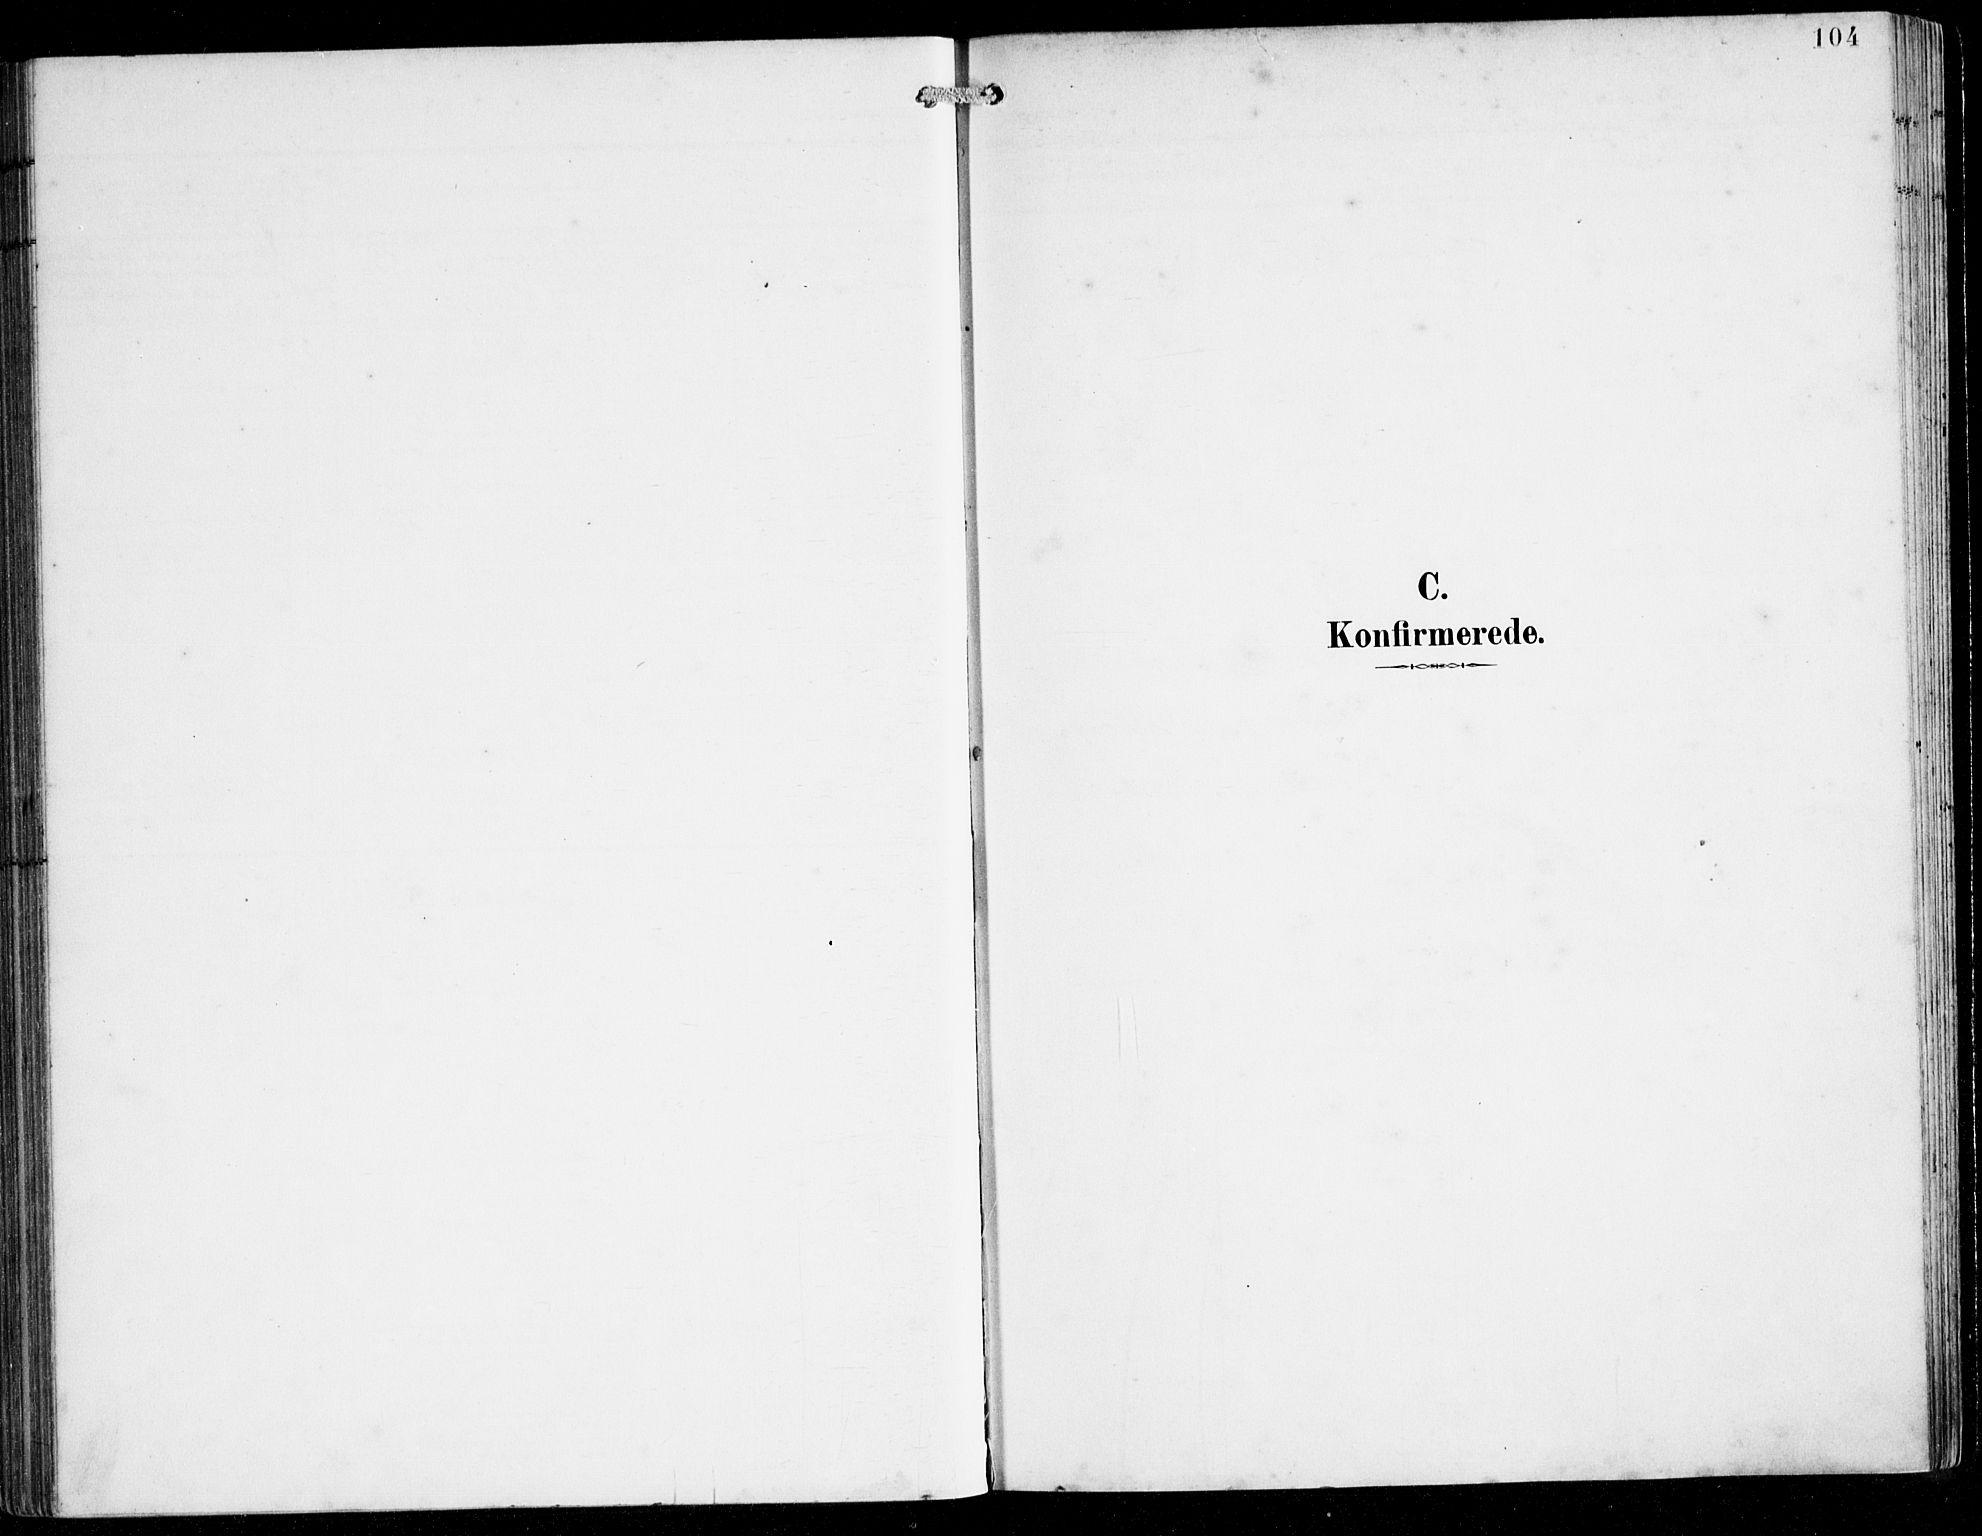 SAB, Herdla Sokneprestembete, H/Hab: Klokkerbok nr. C 1, 1900-1913, s. 104